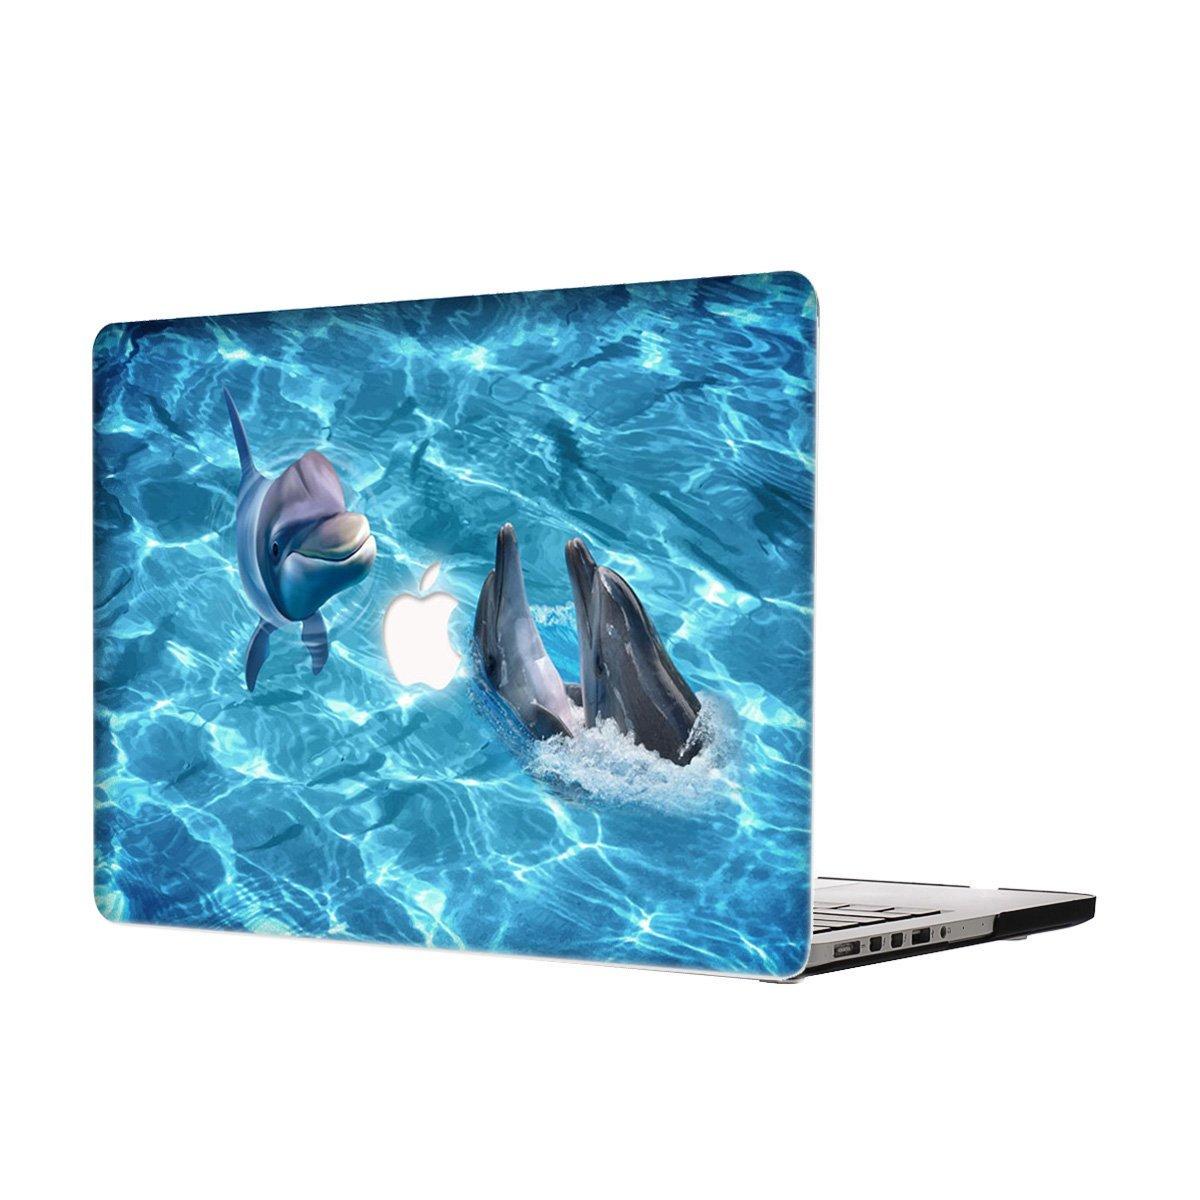 Amazon.com: MacBook Pro 13 Case 2017 & 2016 (Model: A1706 ...